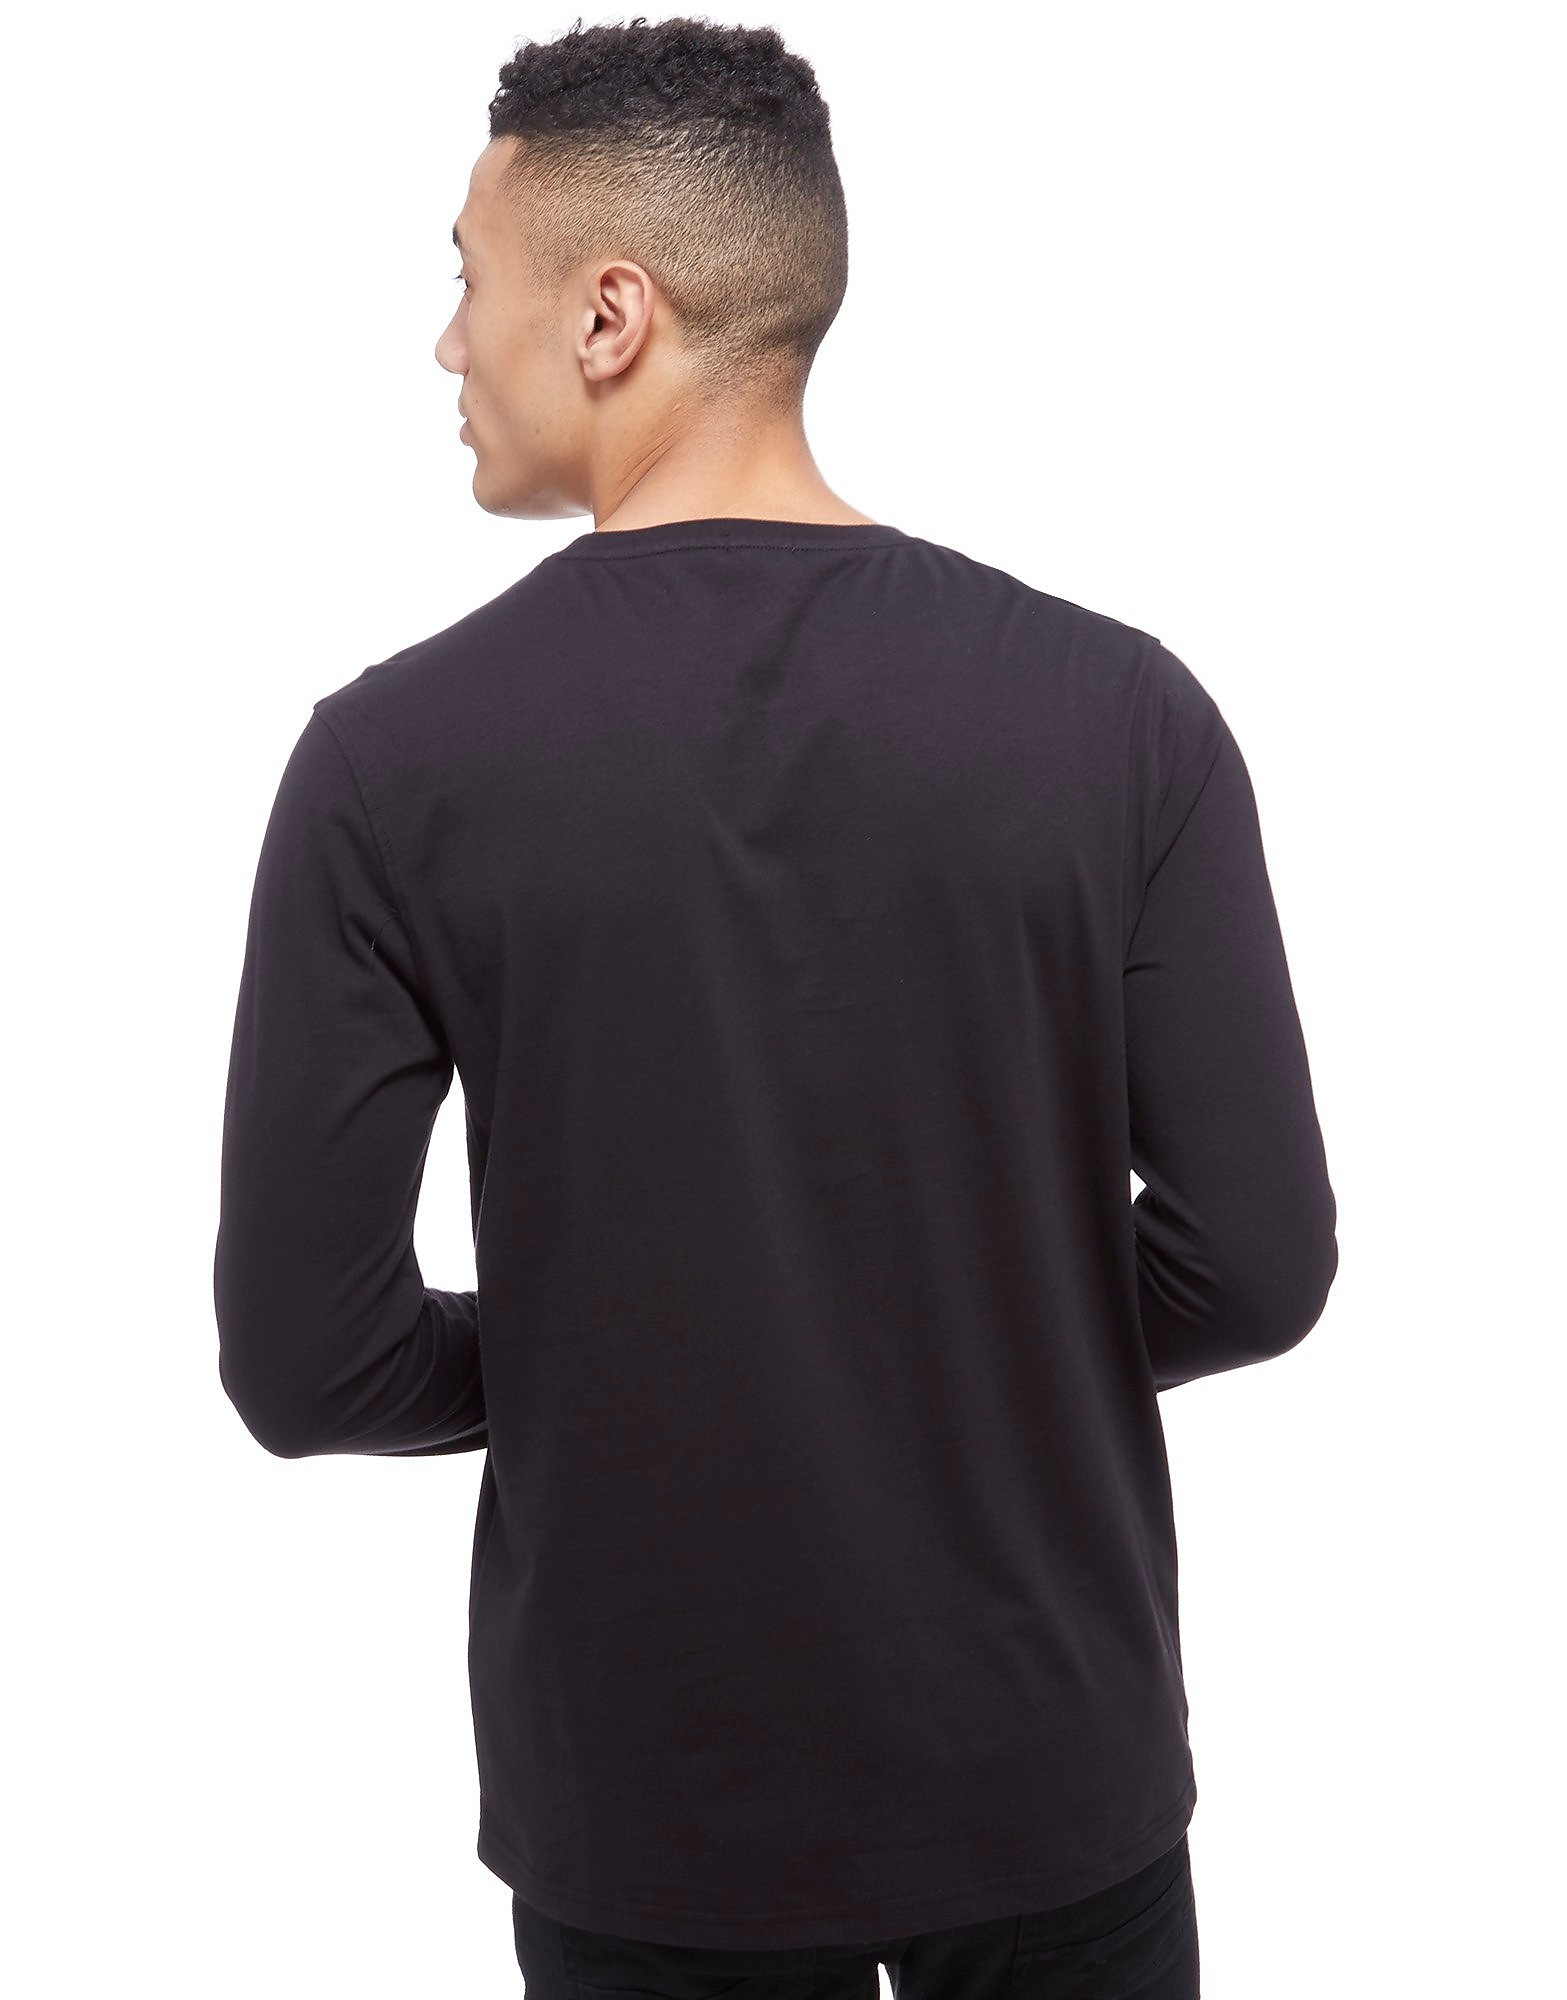 Tommy Hilfiger Icon Basic Long Sleeve T-Shirt